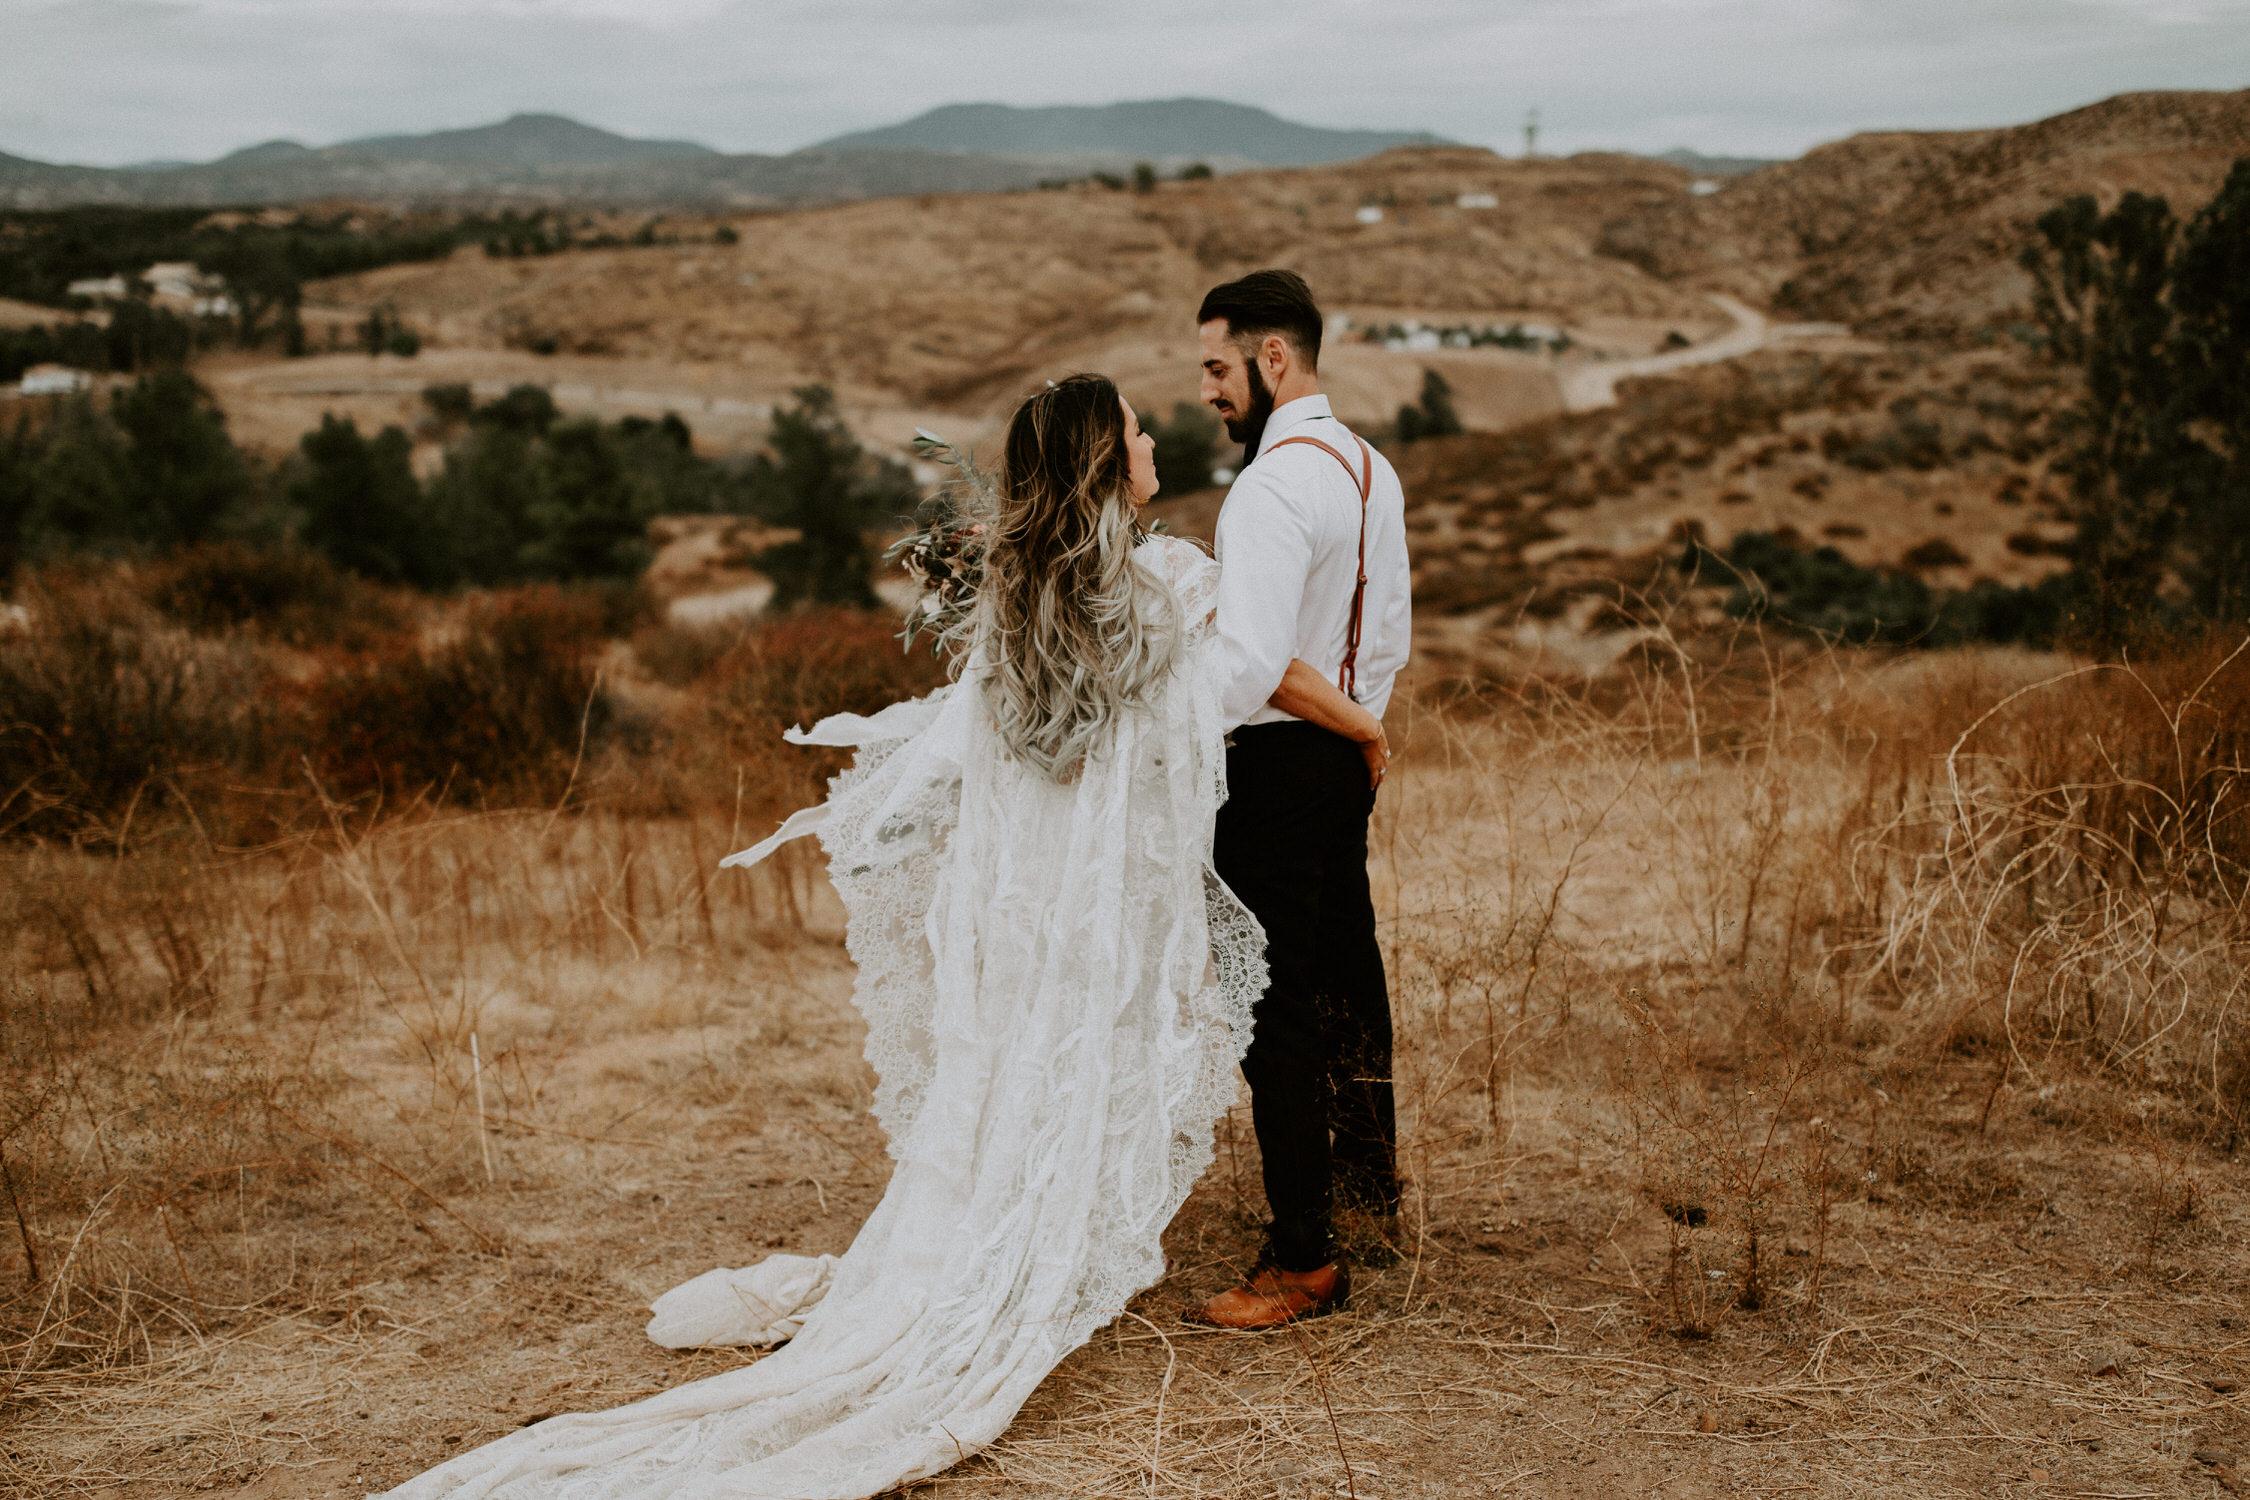 couple-intimate-wedding-temecula-727.jpg